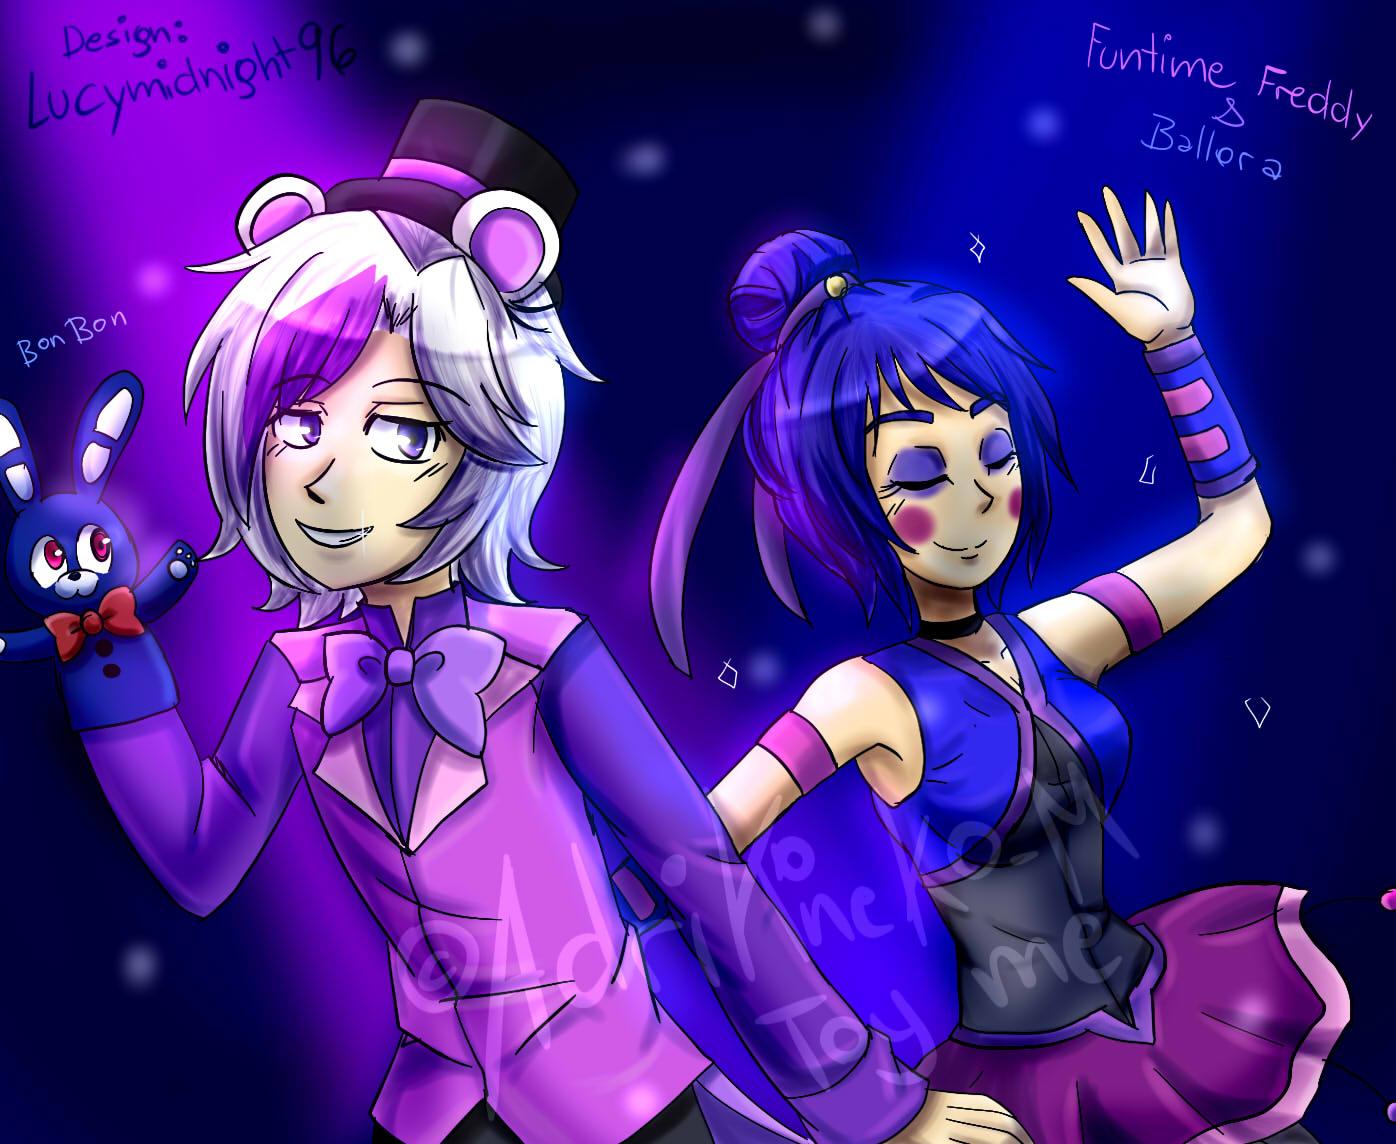 FunTime Freddy And Ballora Art Trade By AdriKoneko Mizuiro